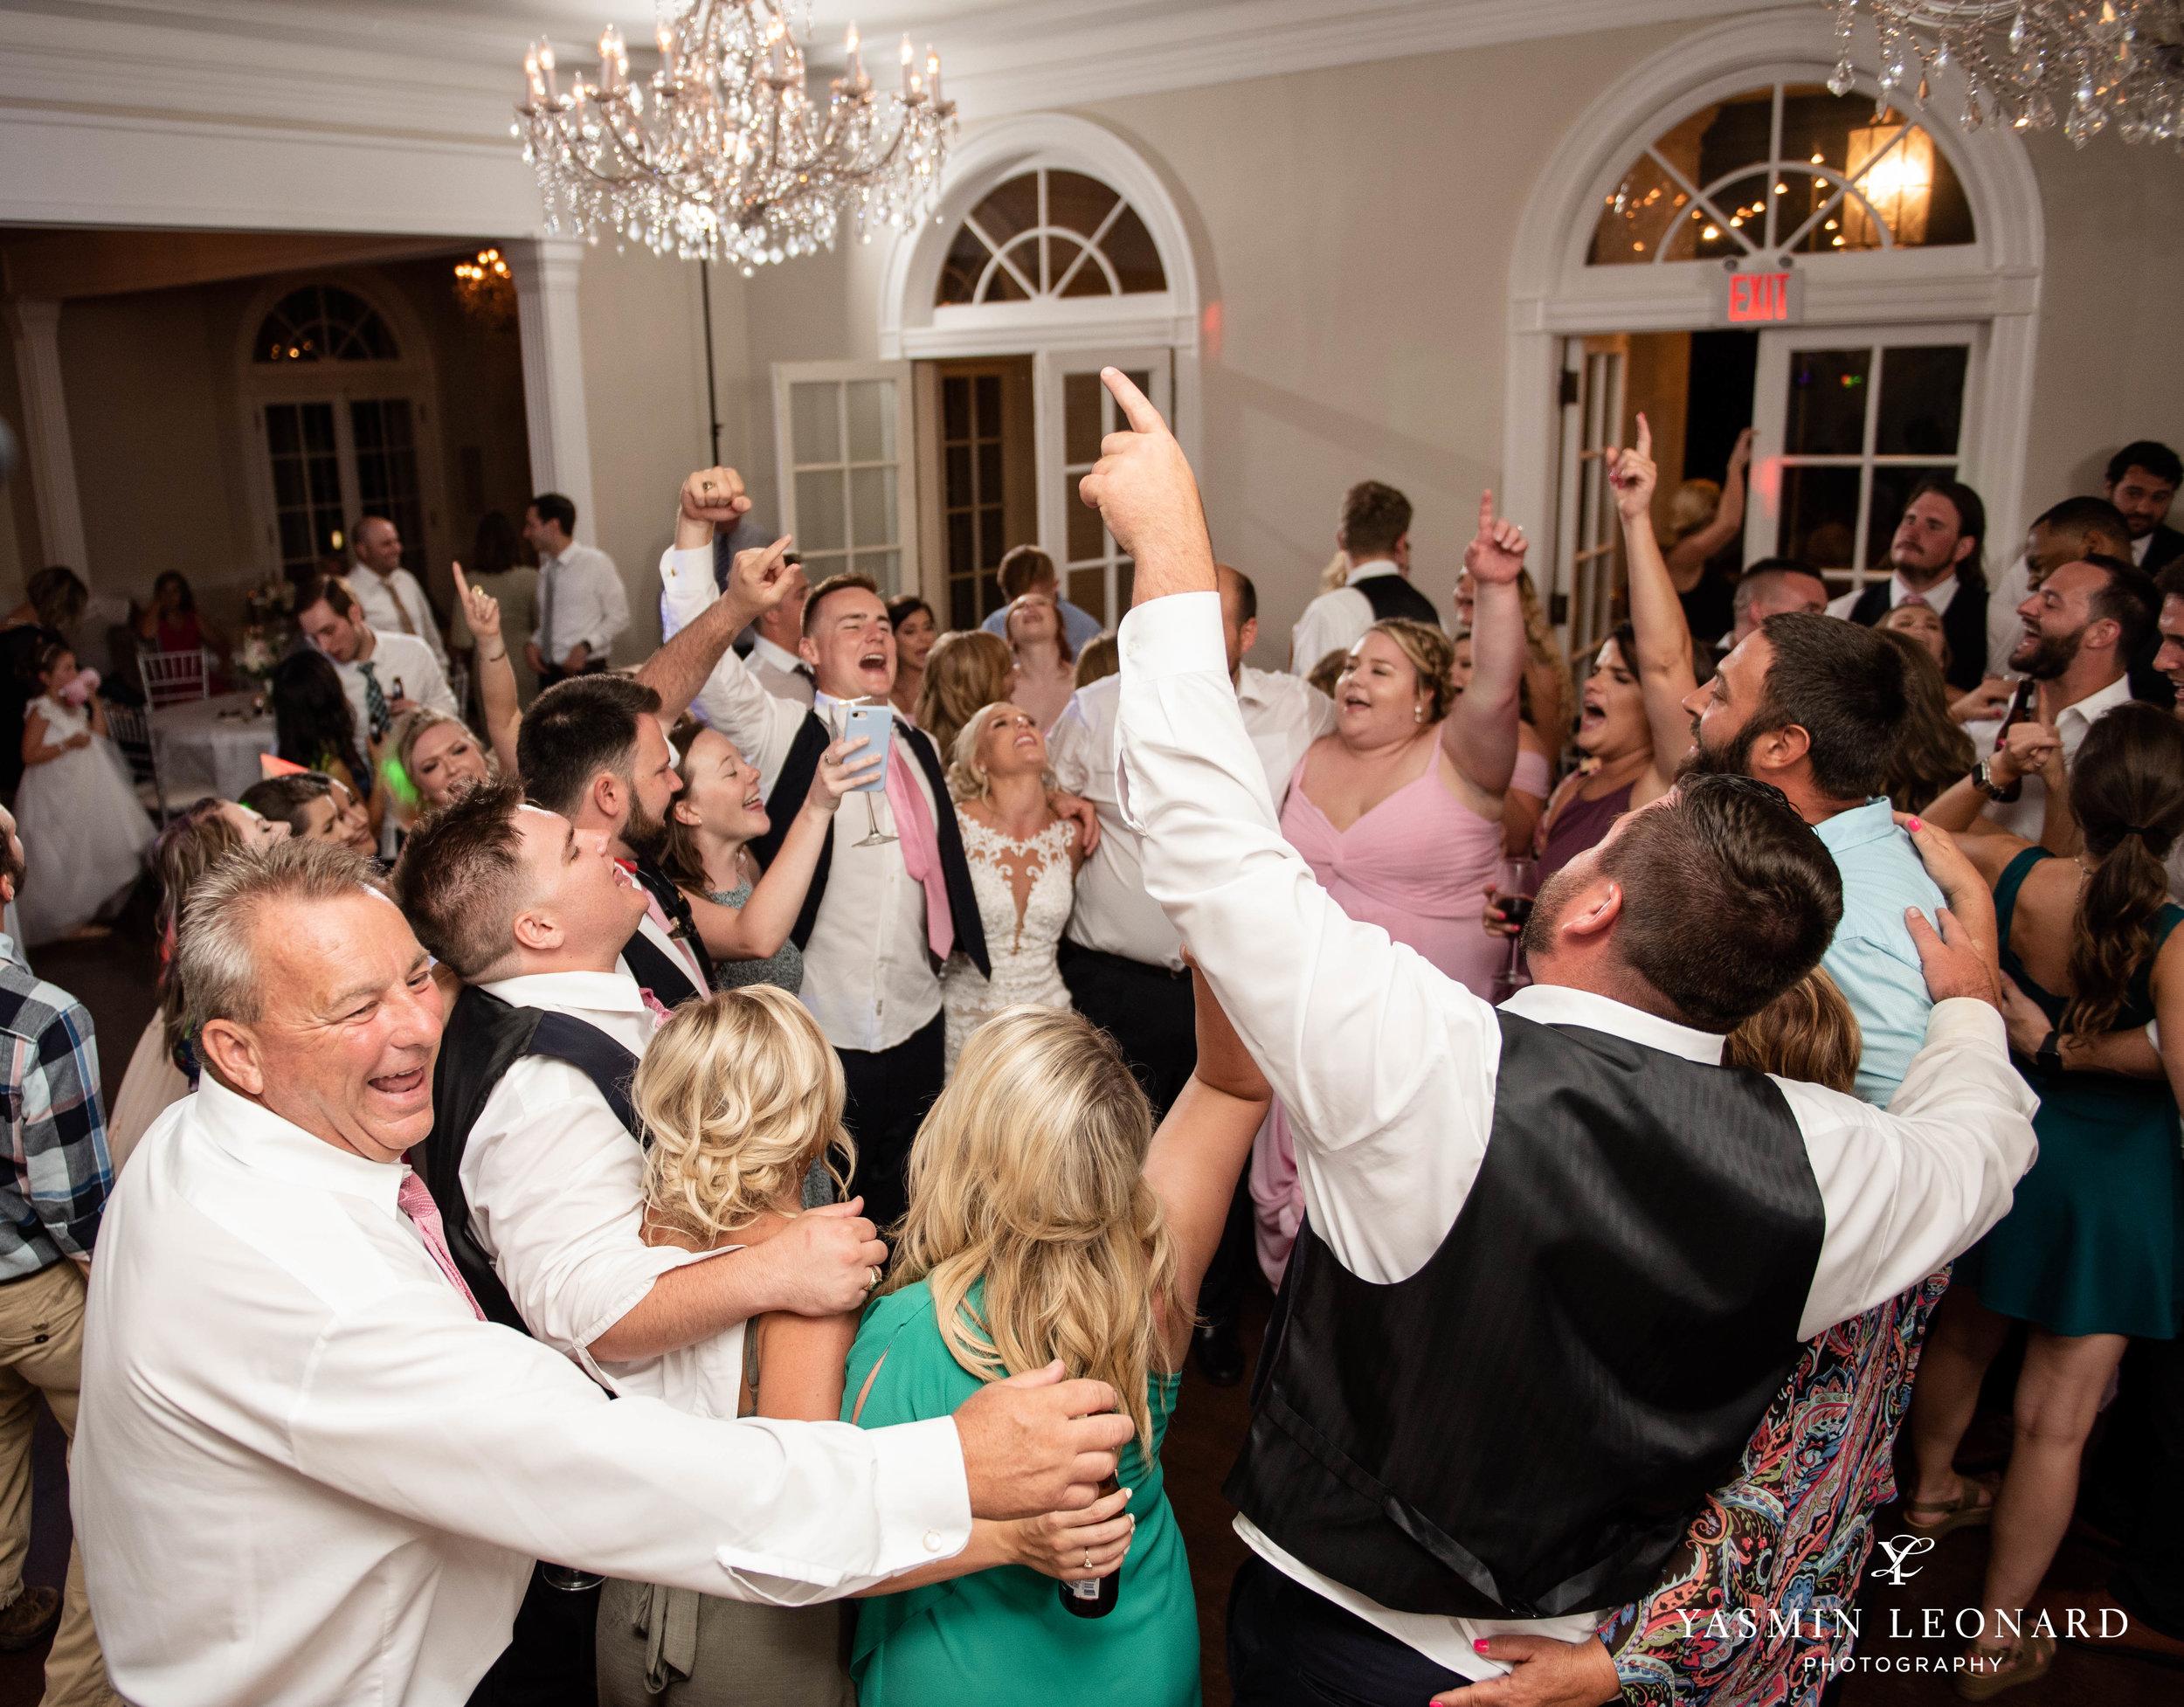 Separk Mansion - NC Weddings - Gastonia Wedding - NC Wedding Venues - Pink and Blue Wedding Ideas - Pink Bridesmaid Dresses - Yasmin Leonard Photography-72.jpg